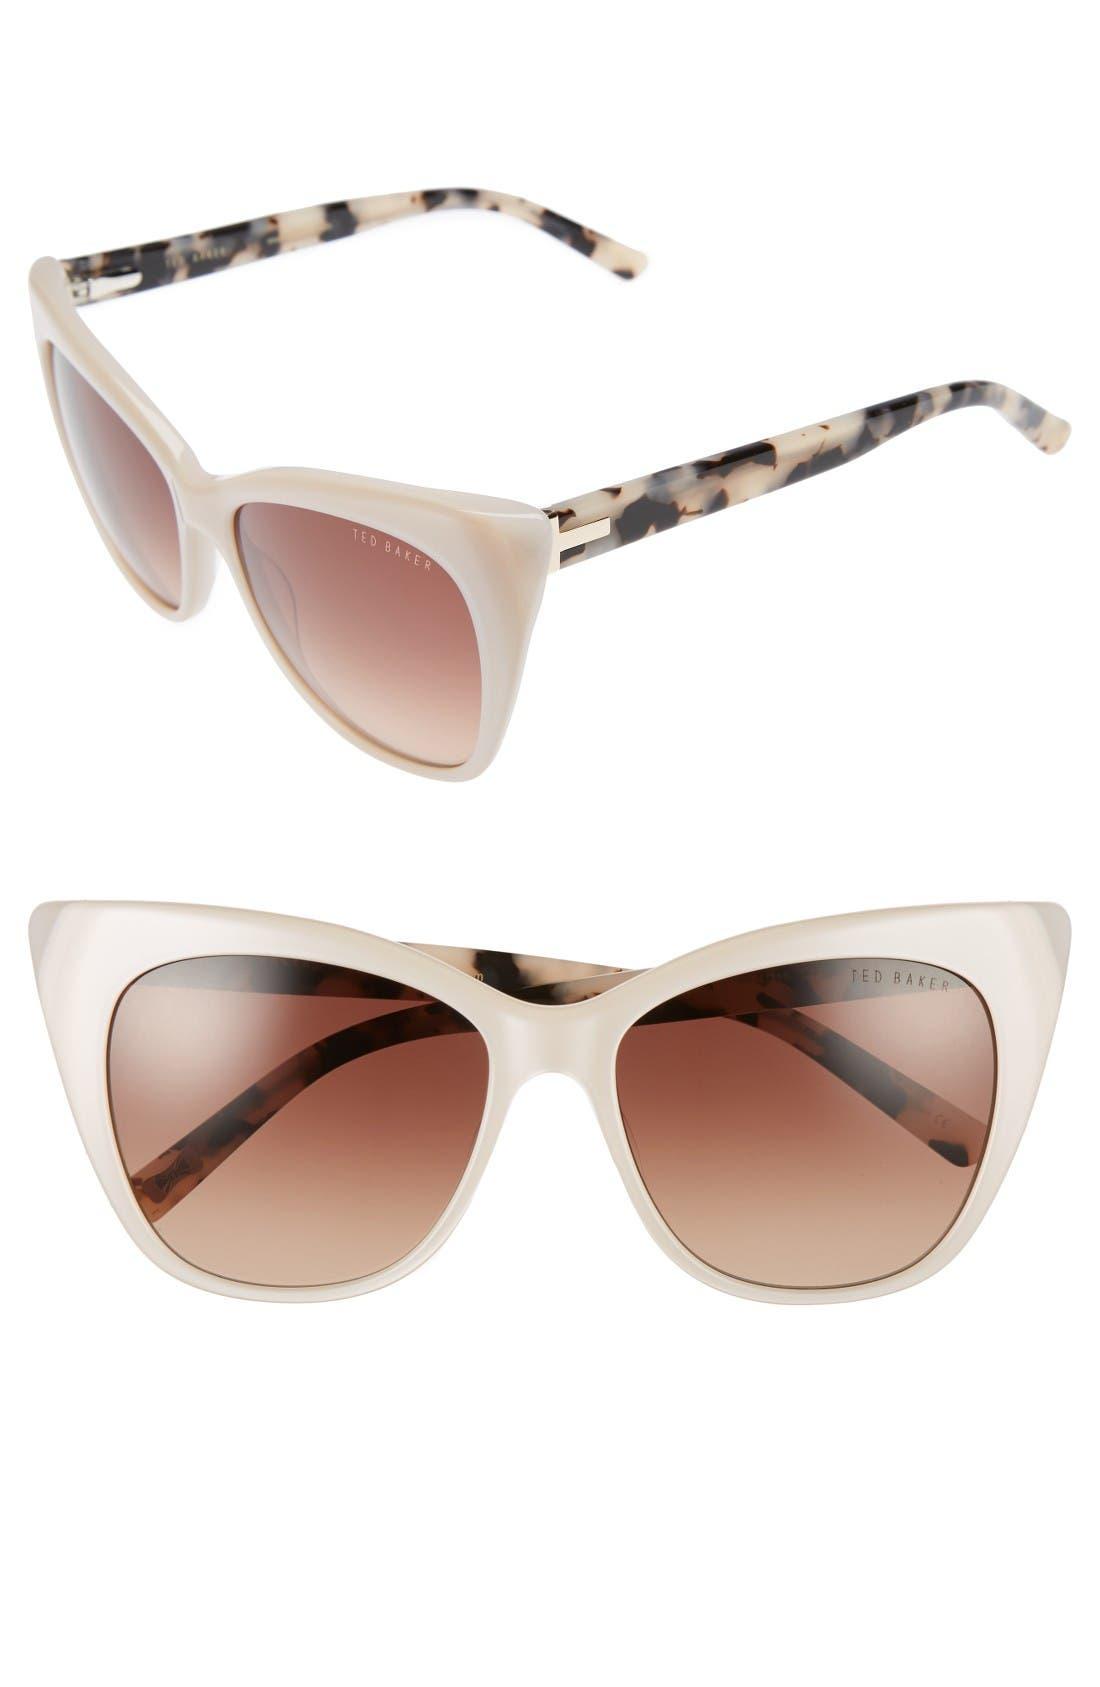 Main Image - Ted Baker London 54mm Cat Eye Sunglasses